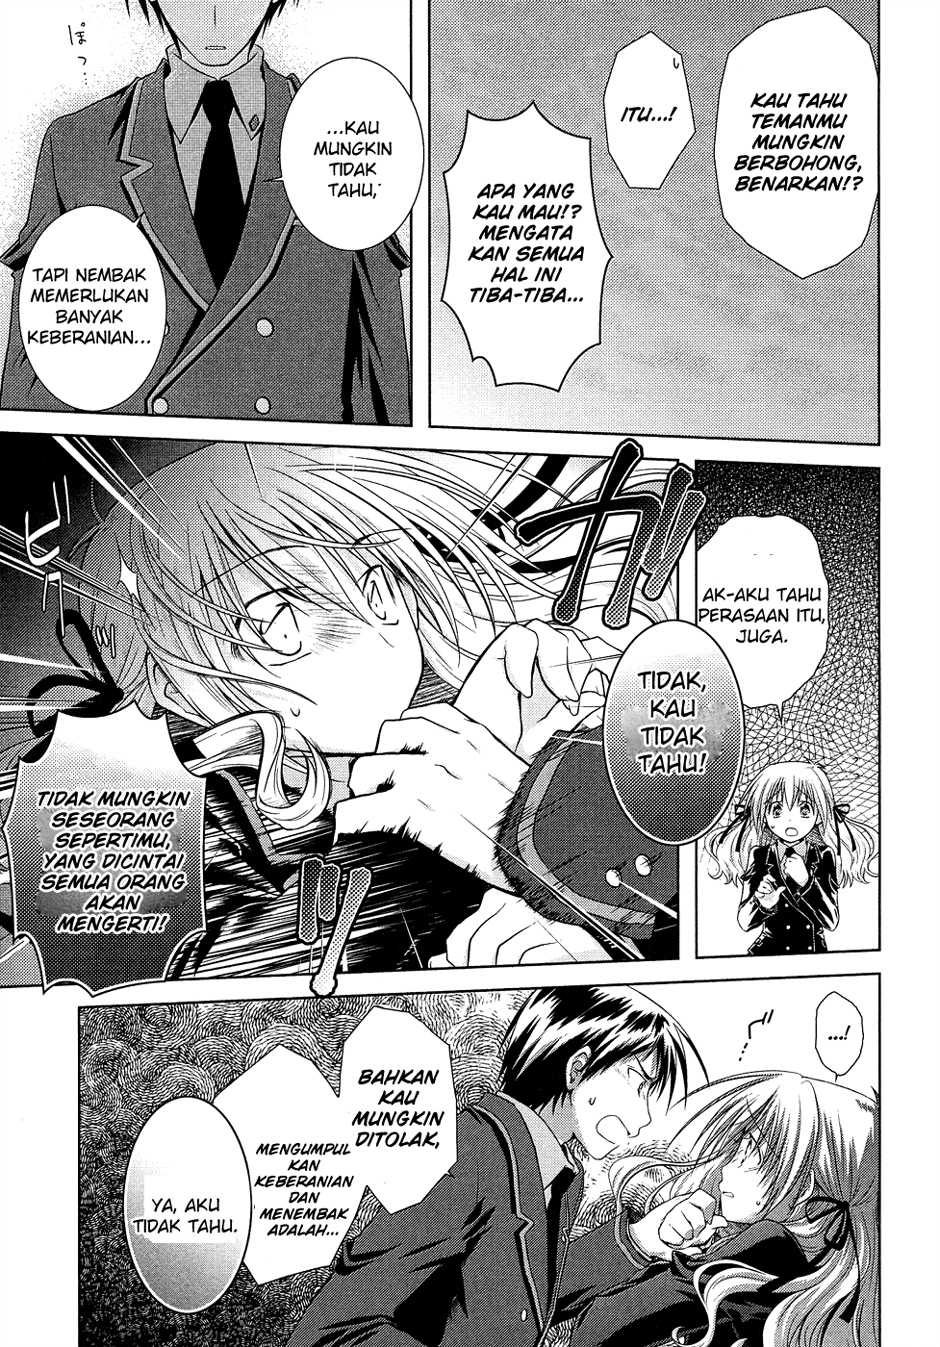 Komik iris zero 011 12 Indonesia iris zero 011 Terbaru 22 Baca Manga Komik Indonesia 